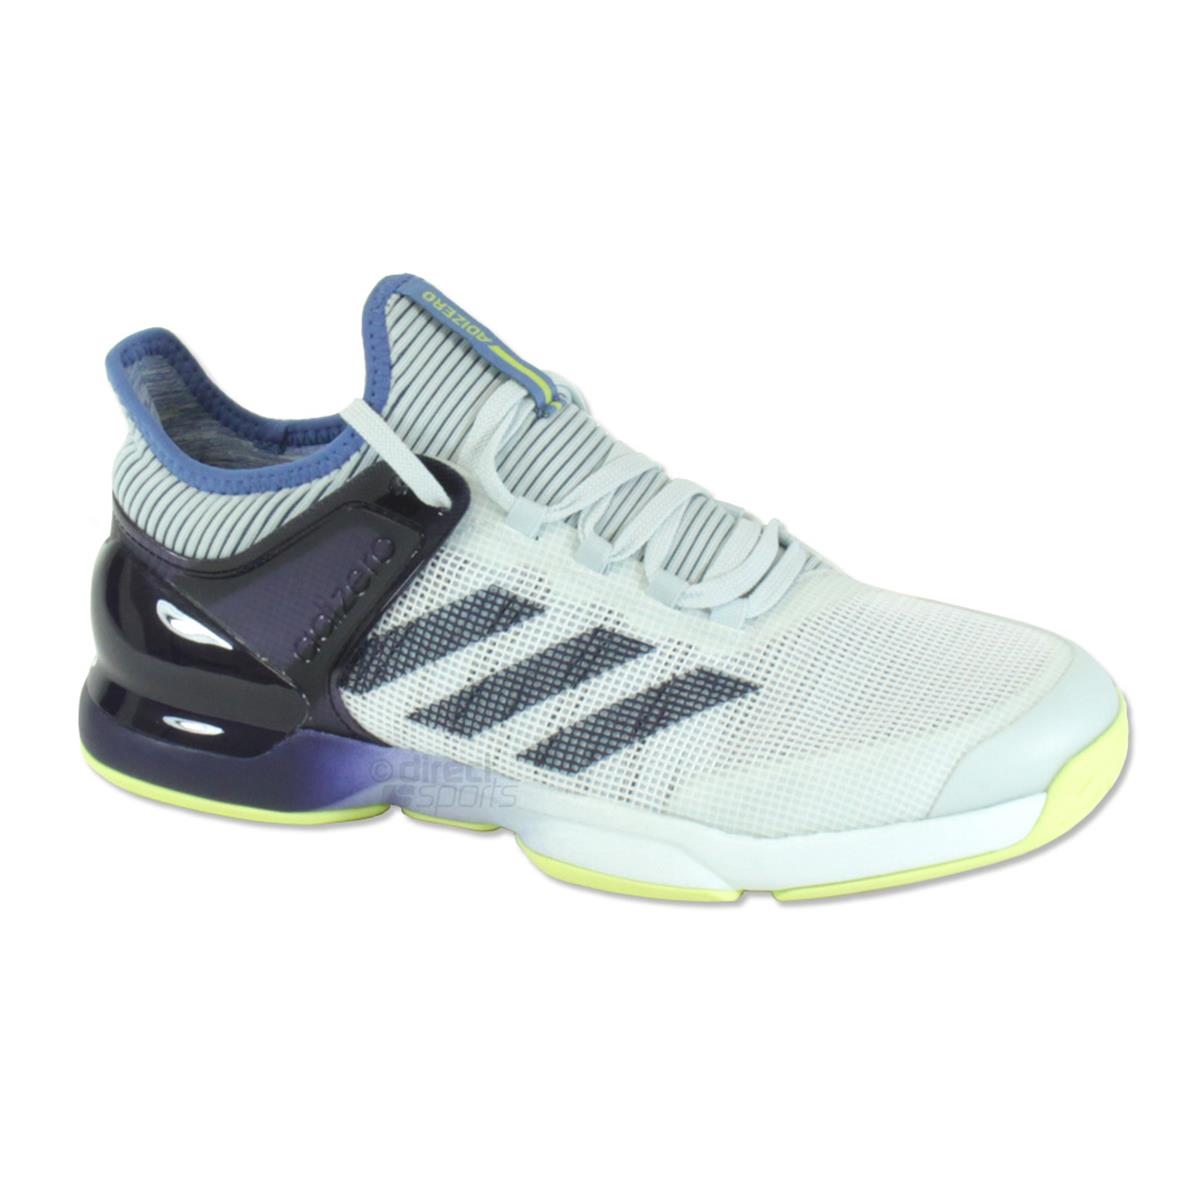 Mens Tennis 2 Ubersonic Adidas Kxiupz Shoesdirectsportseshop Adizero PnO8k0w